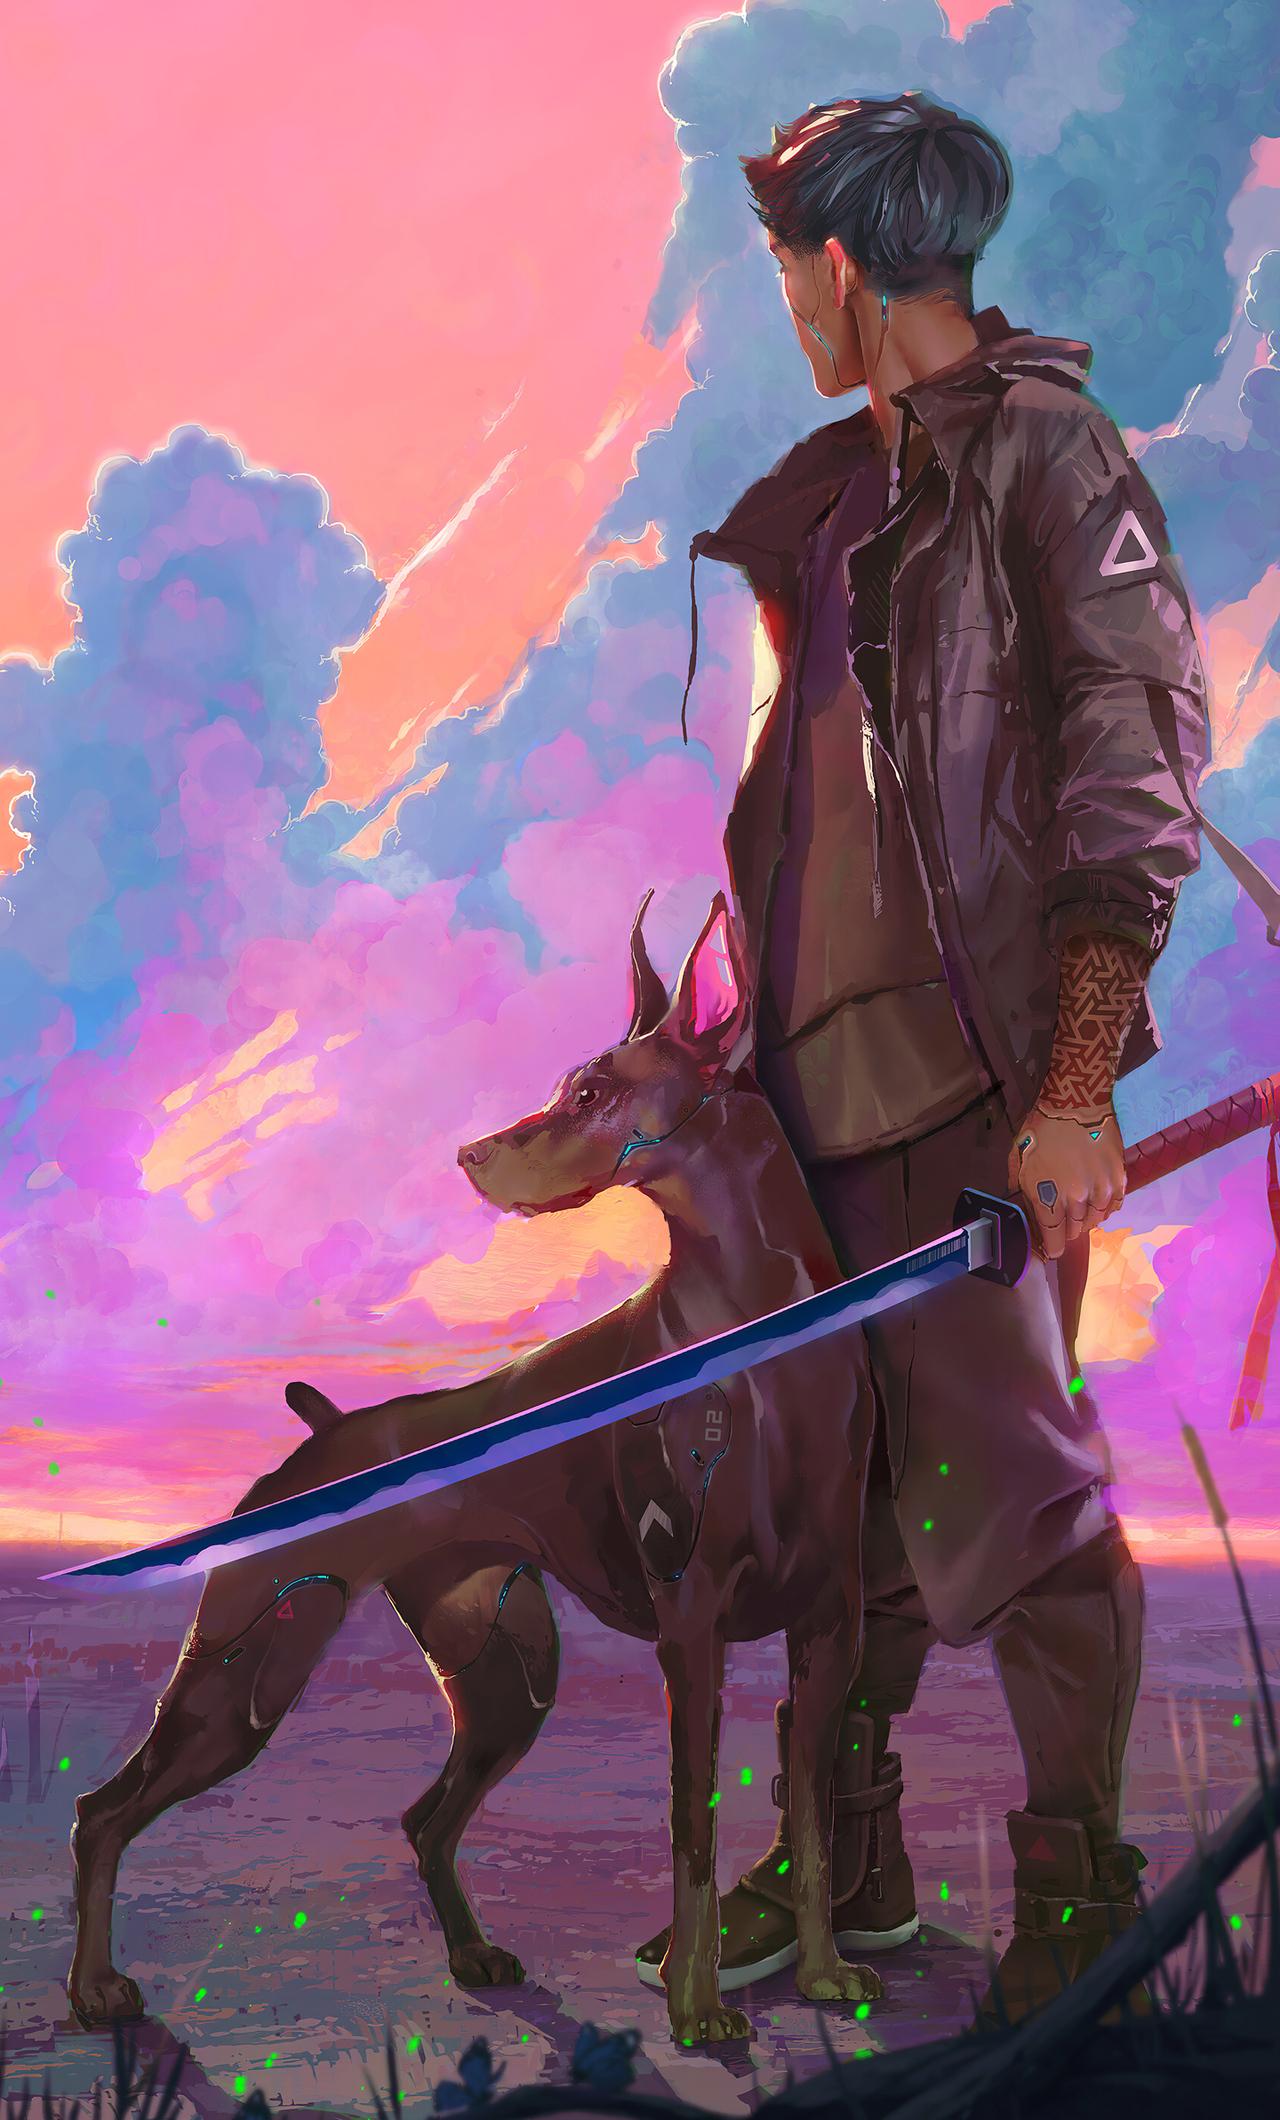 guy-with-his-dog-4k-o0.jpg